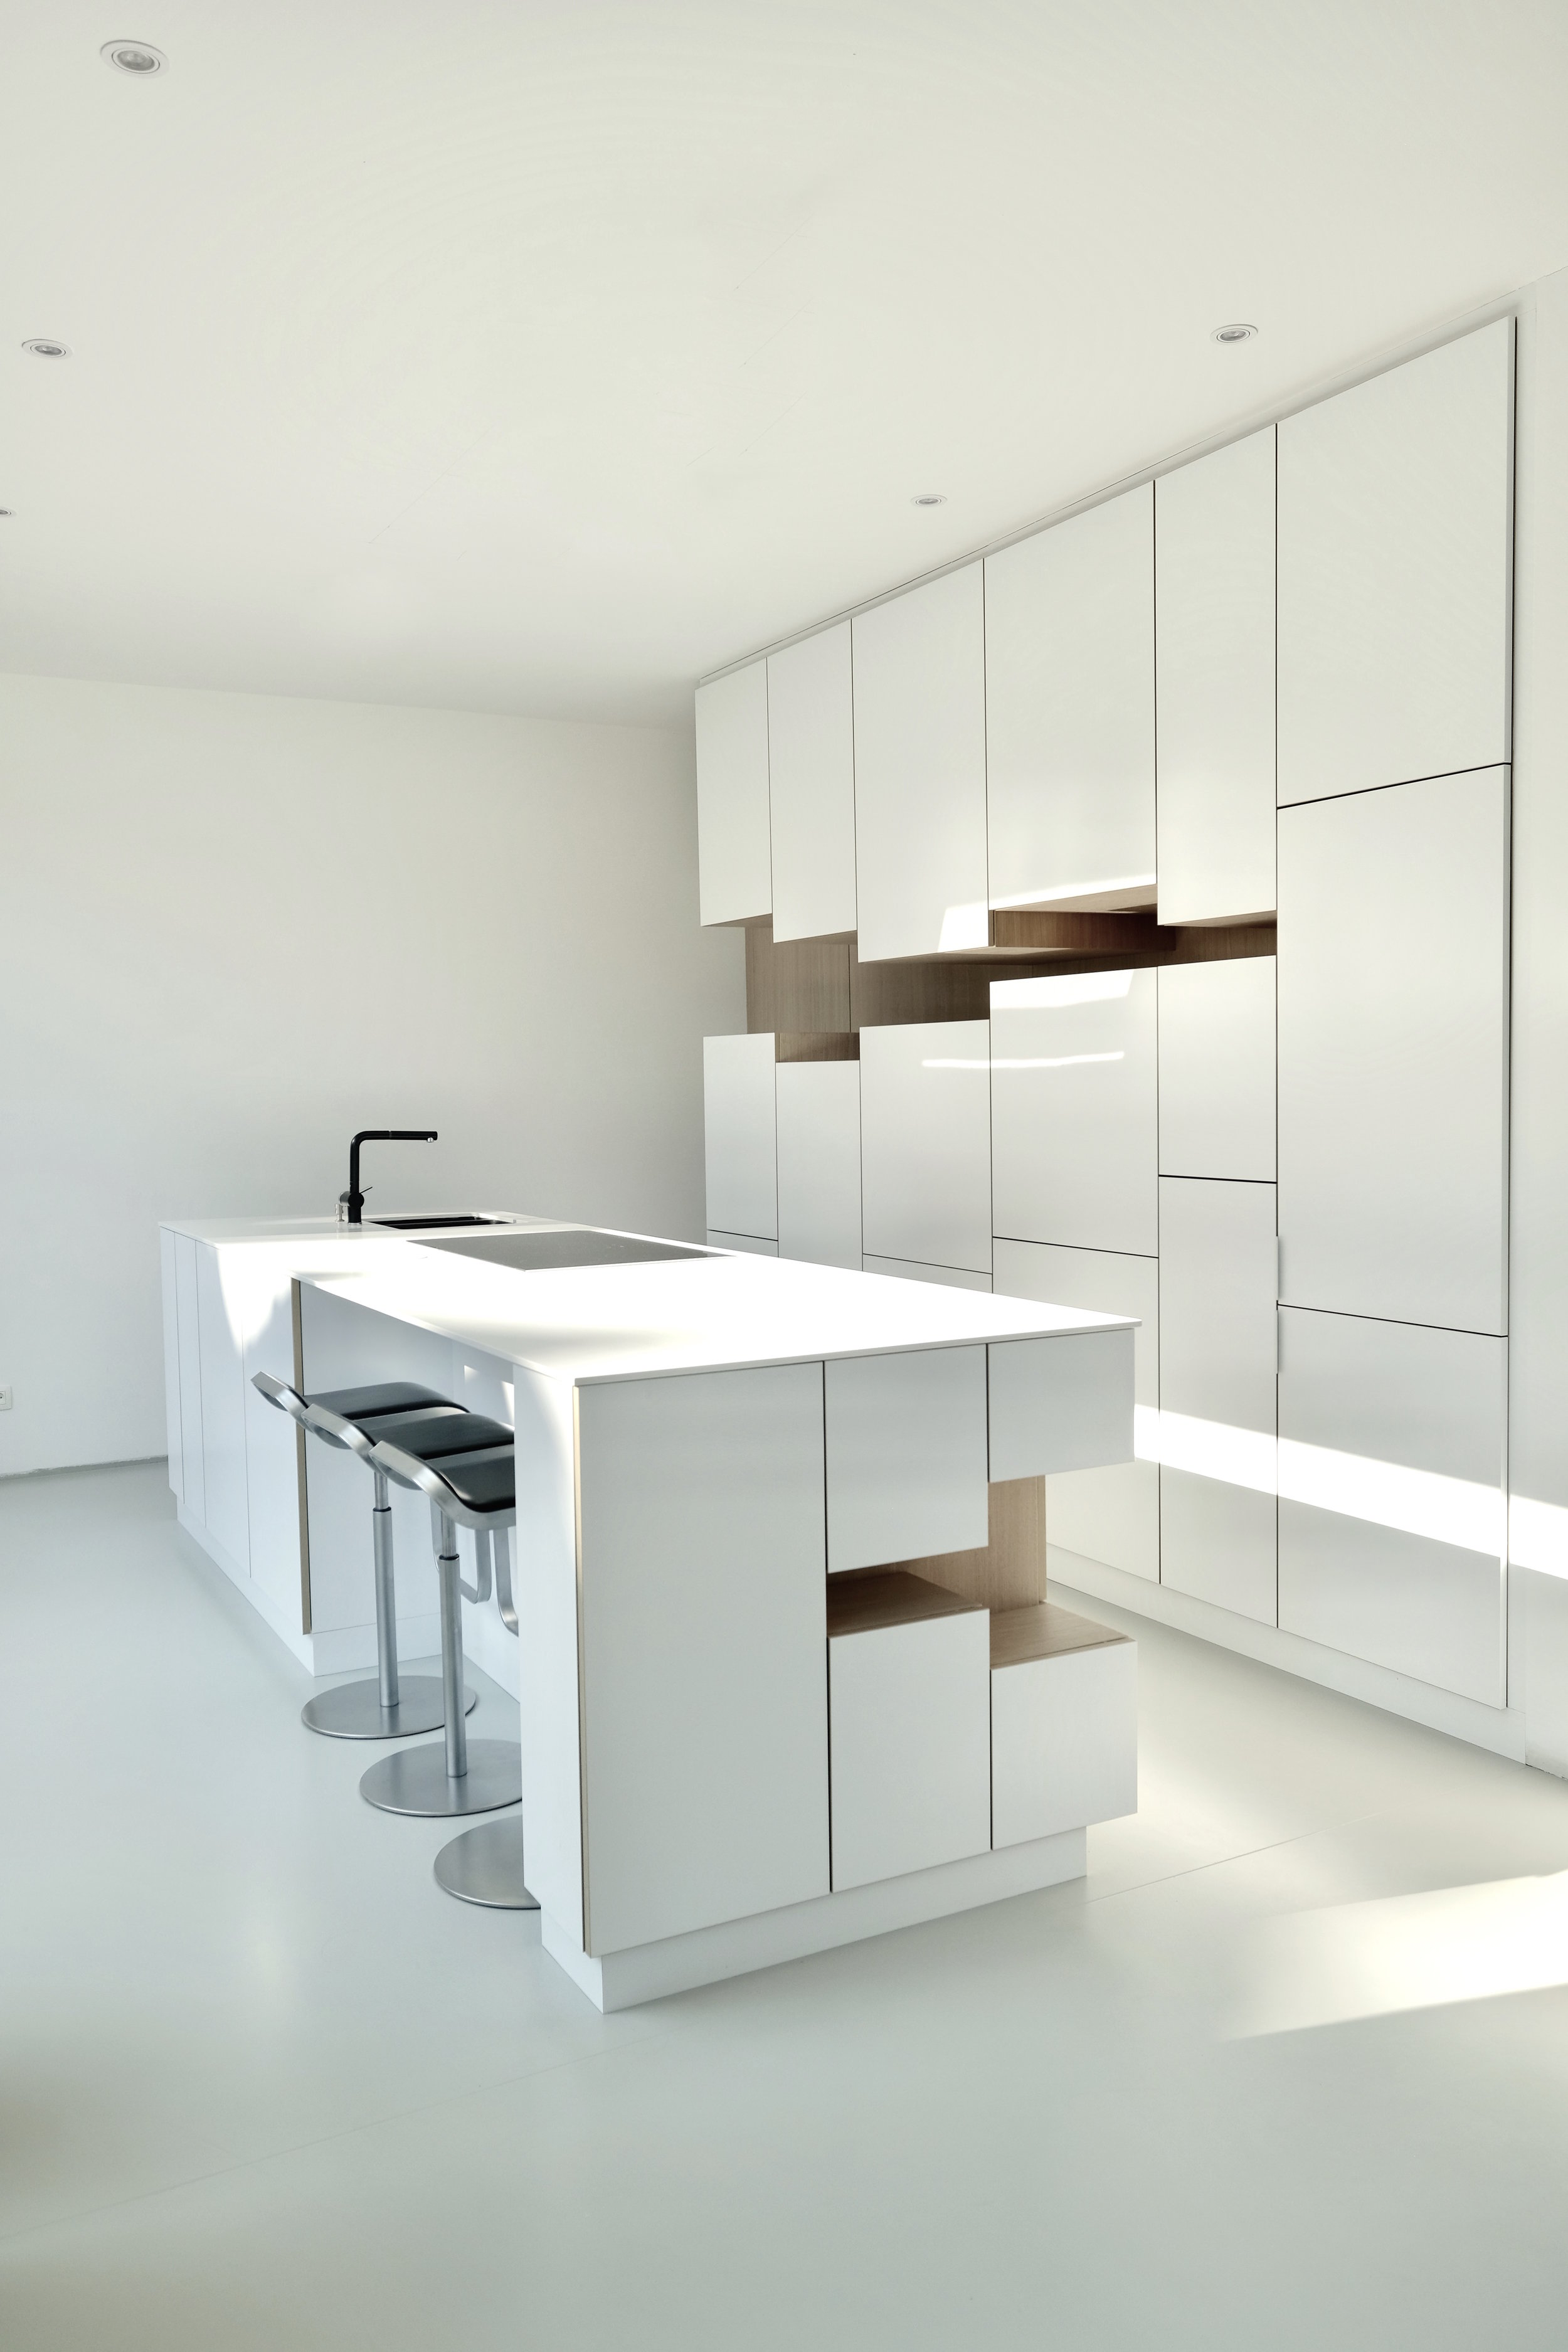 FJanssens Design 2017.jpeg